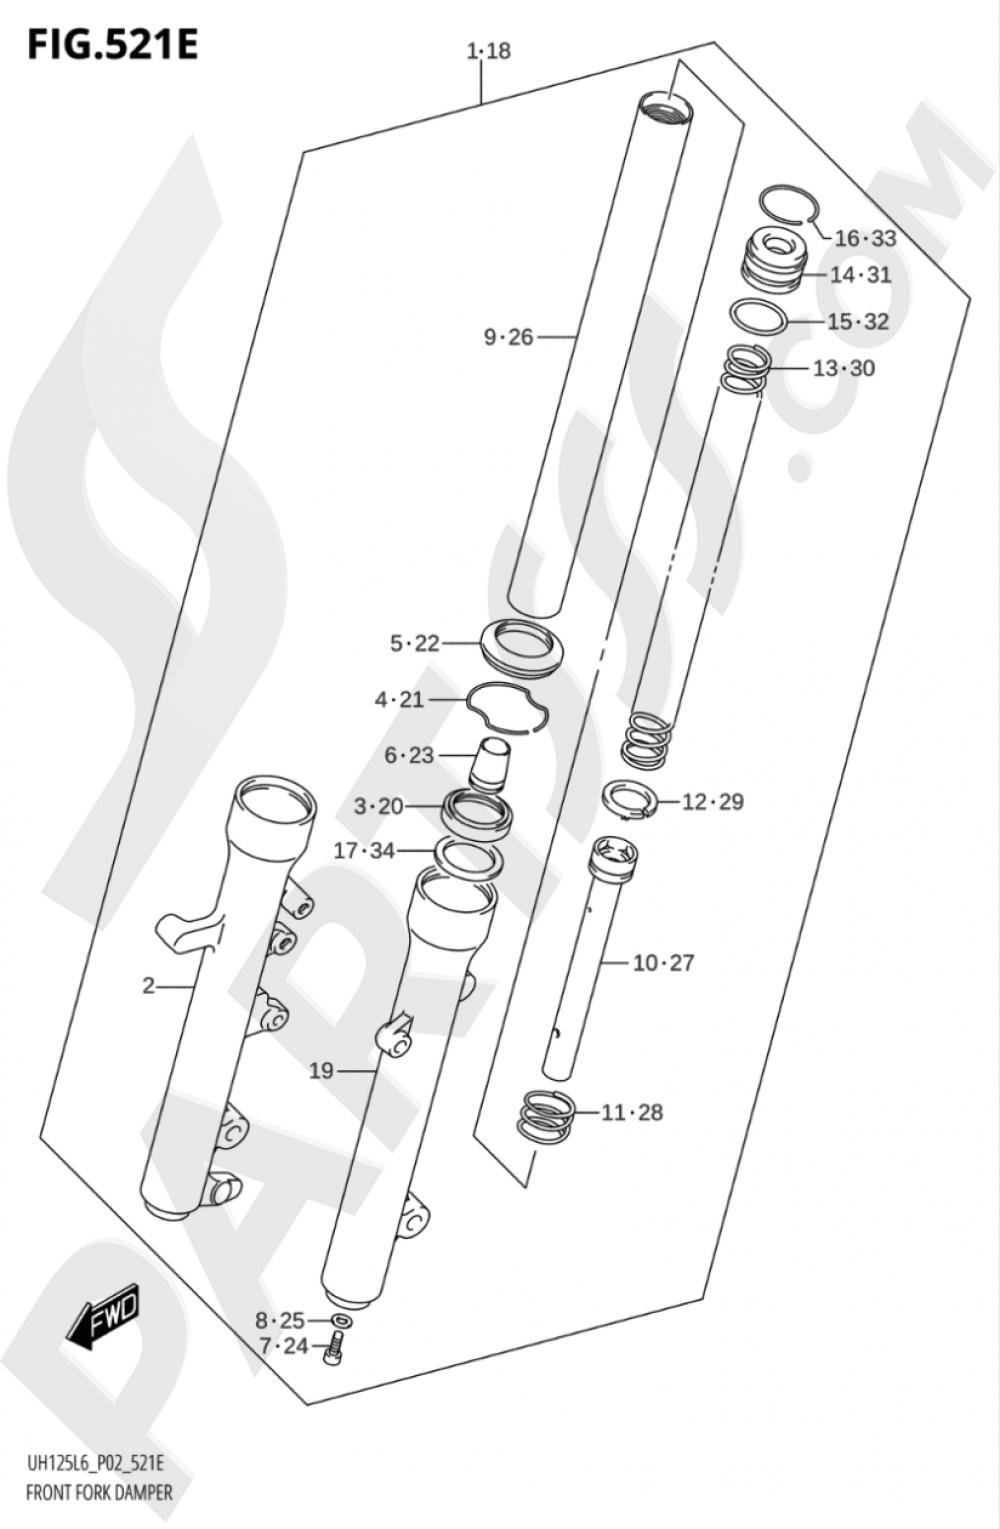 521E - FRONT FORK DAMPER (UH125AL6 P04) Suzuki BURGMAN UH125A 2016